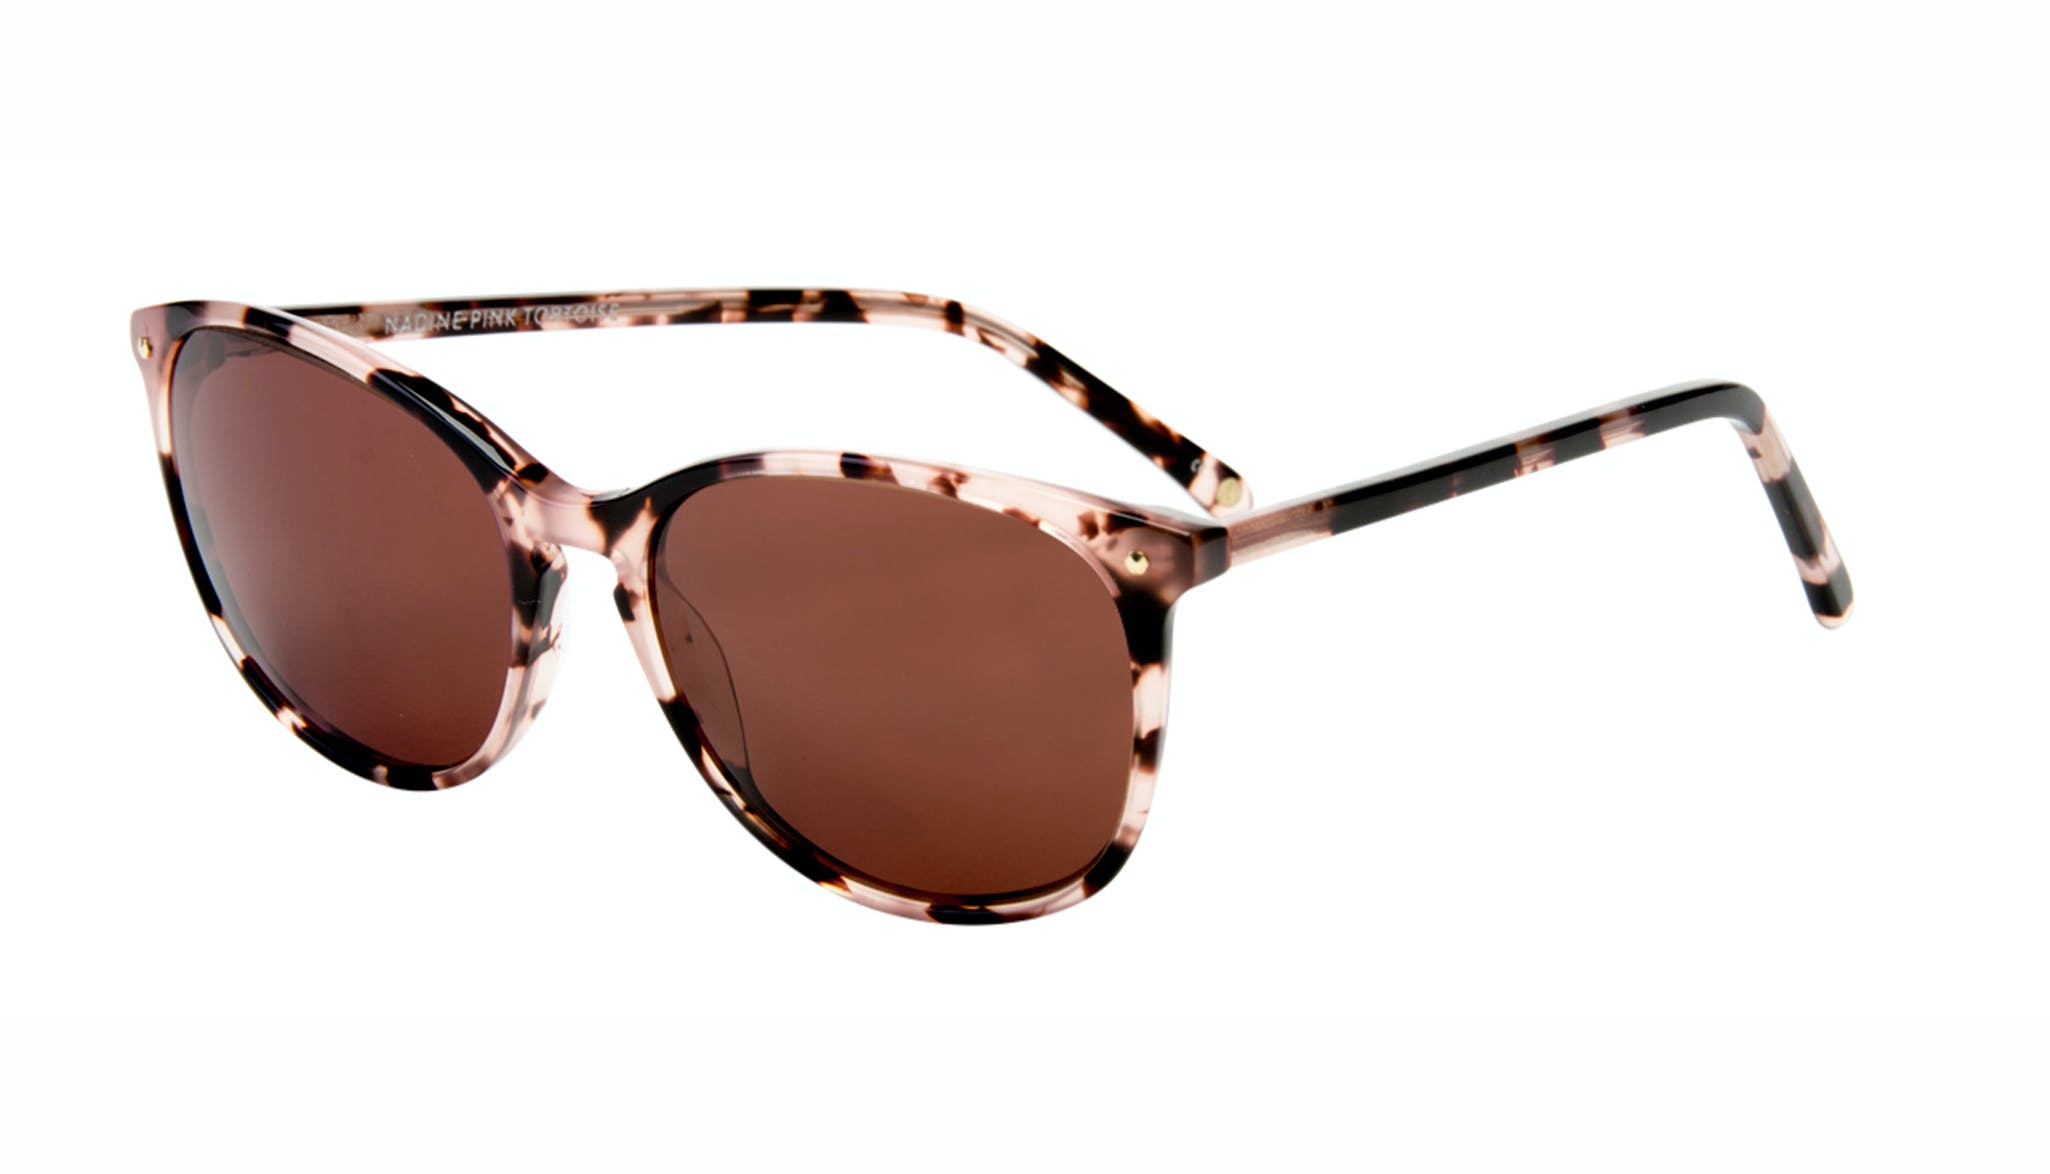 Affordable Fashion Glasses Rectangle Square Round Sunglasses Women Nadine Pink Tortoise Tilt